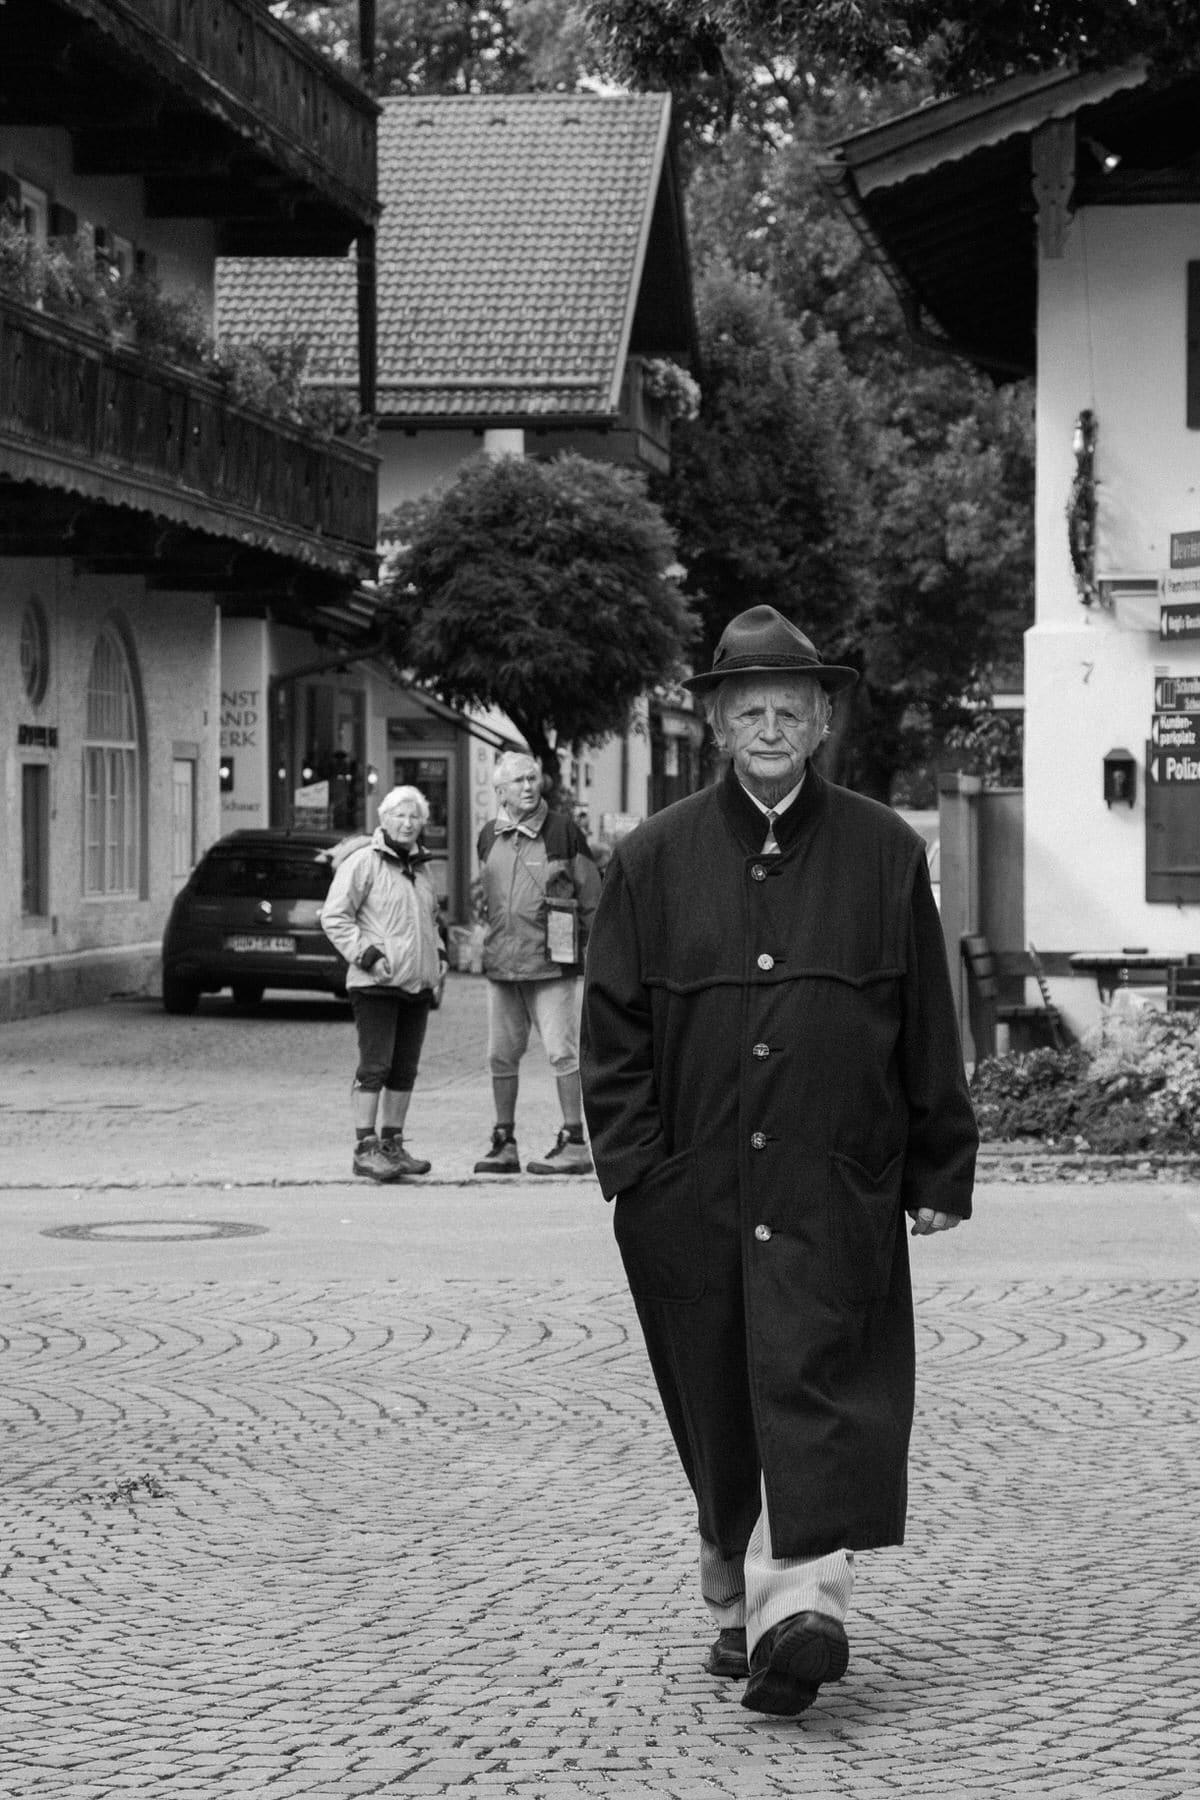 Garmisch_Germany-black-and-white-fine-art-photography-by-Studio-L-photographer-Laura-Schneider-_3655